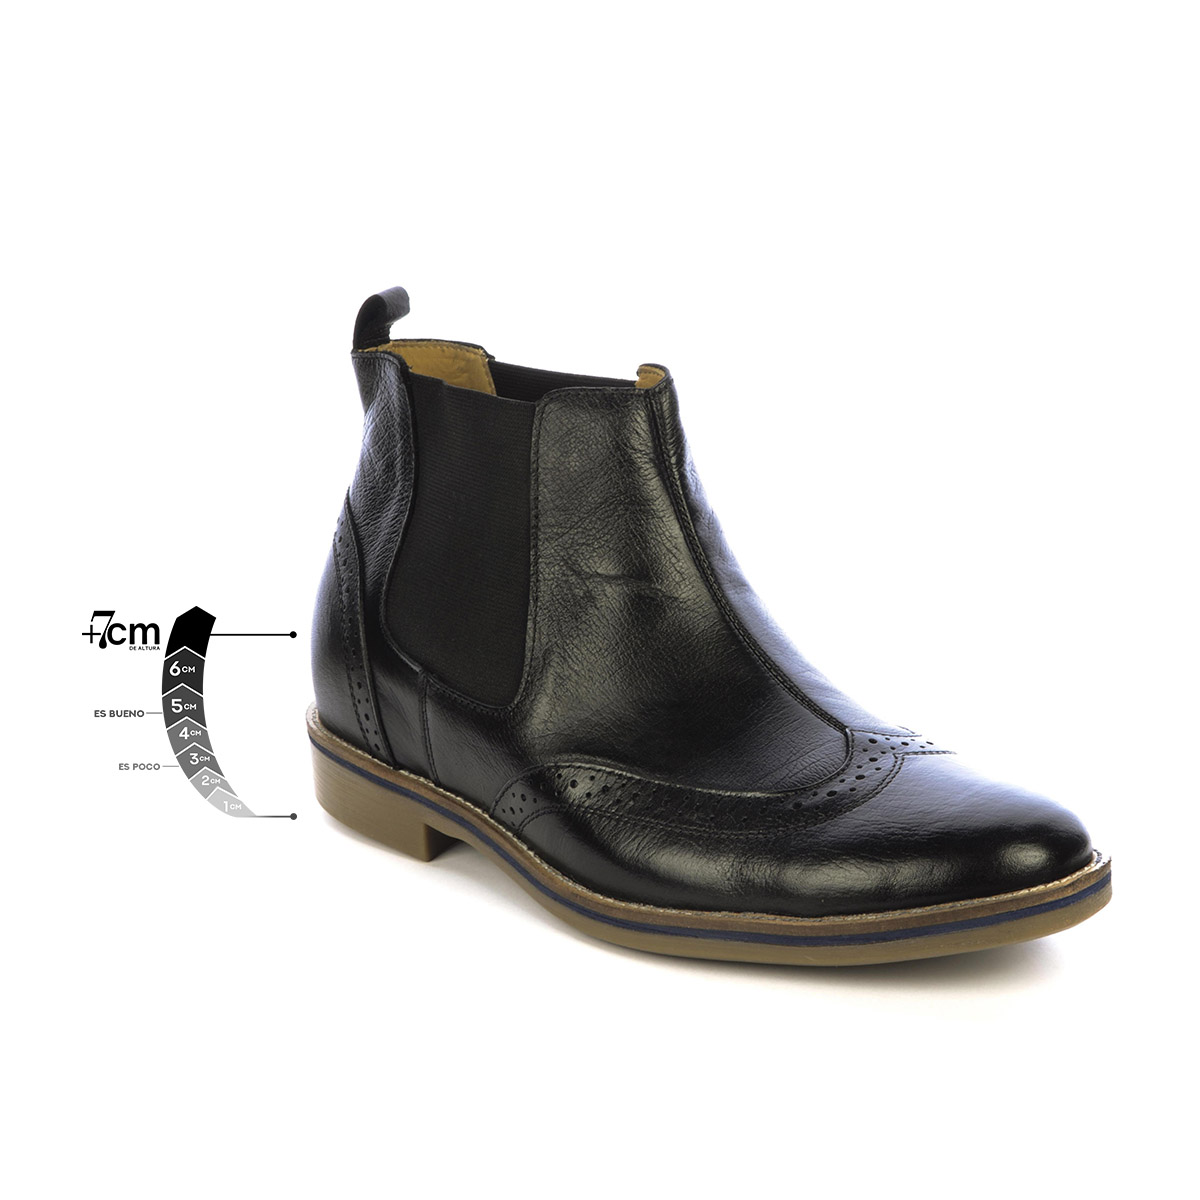 Botín Casual Empire Negro Max Denegri + 7 cms de Altura_77490